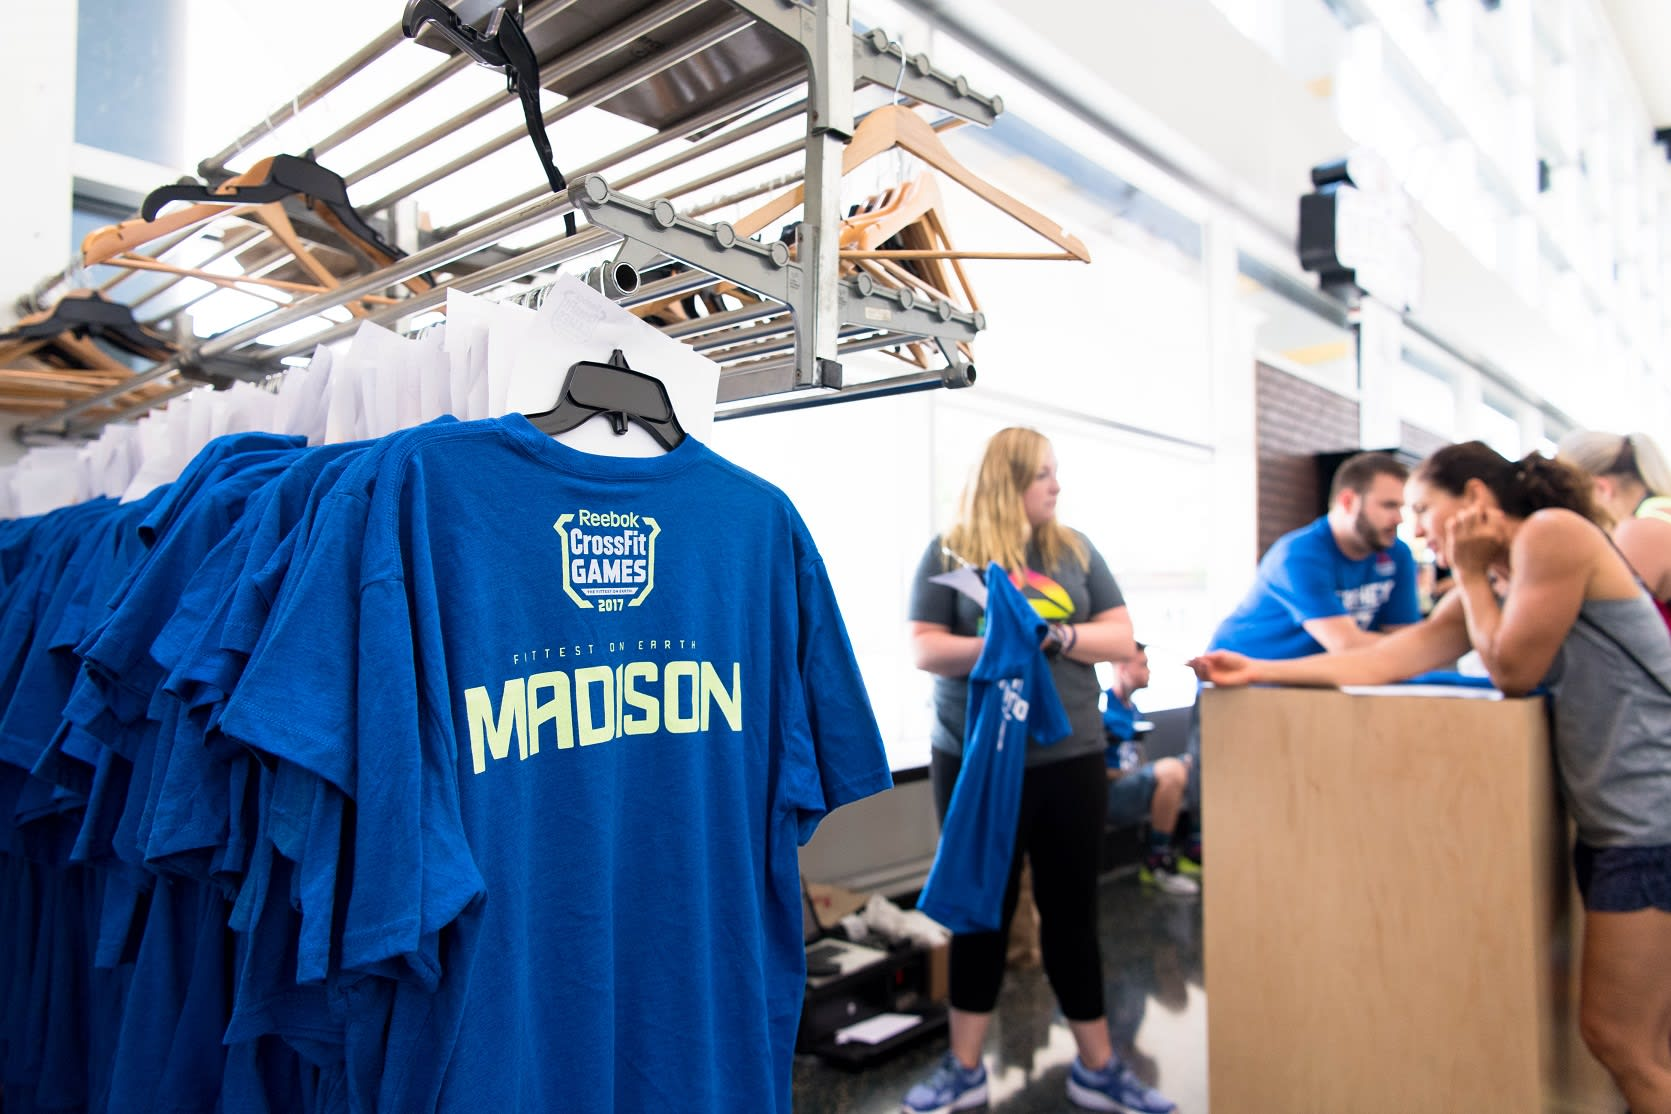 crossfit-games-custom-jersey